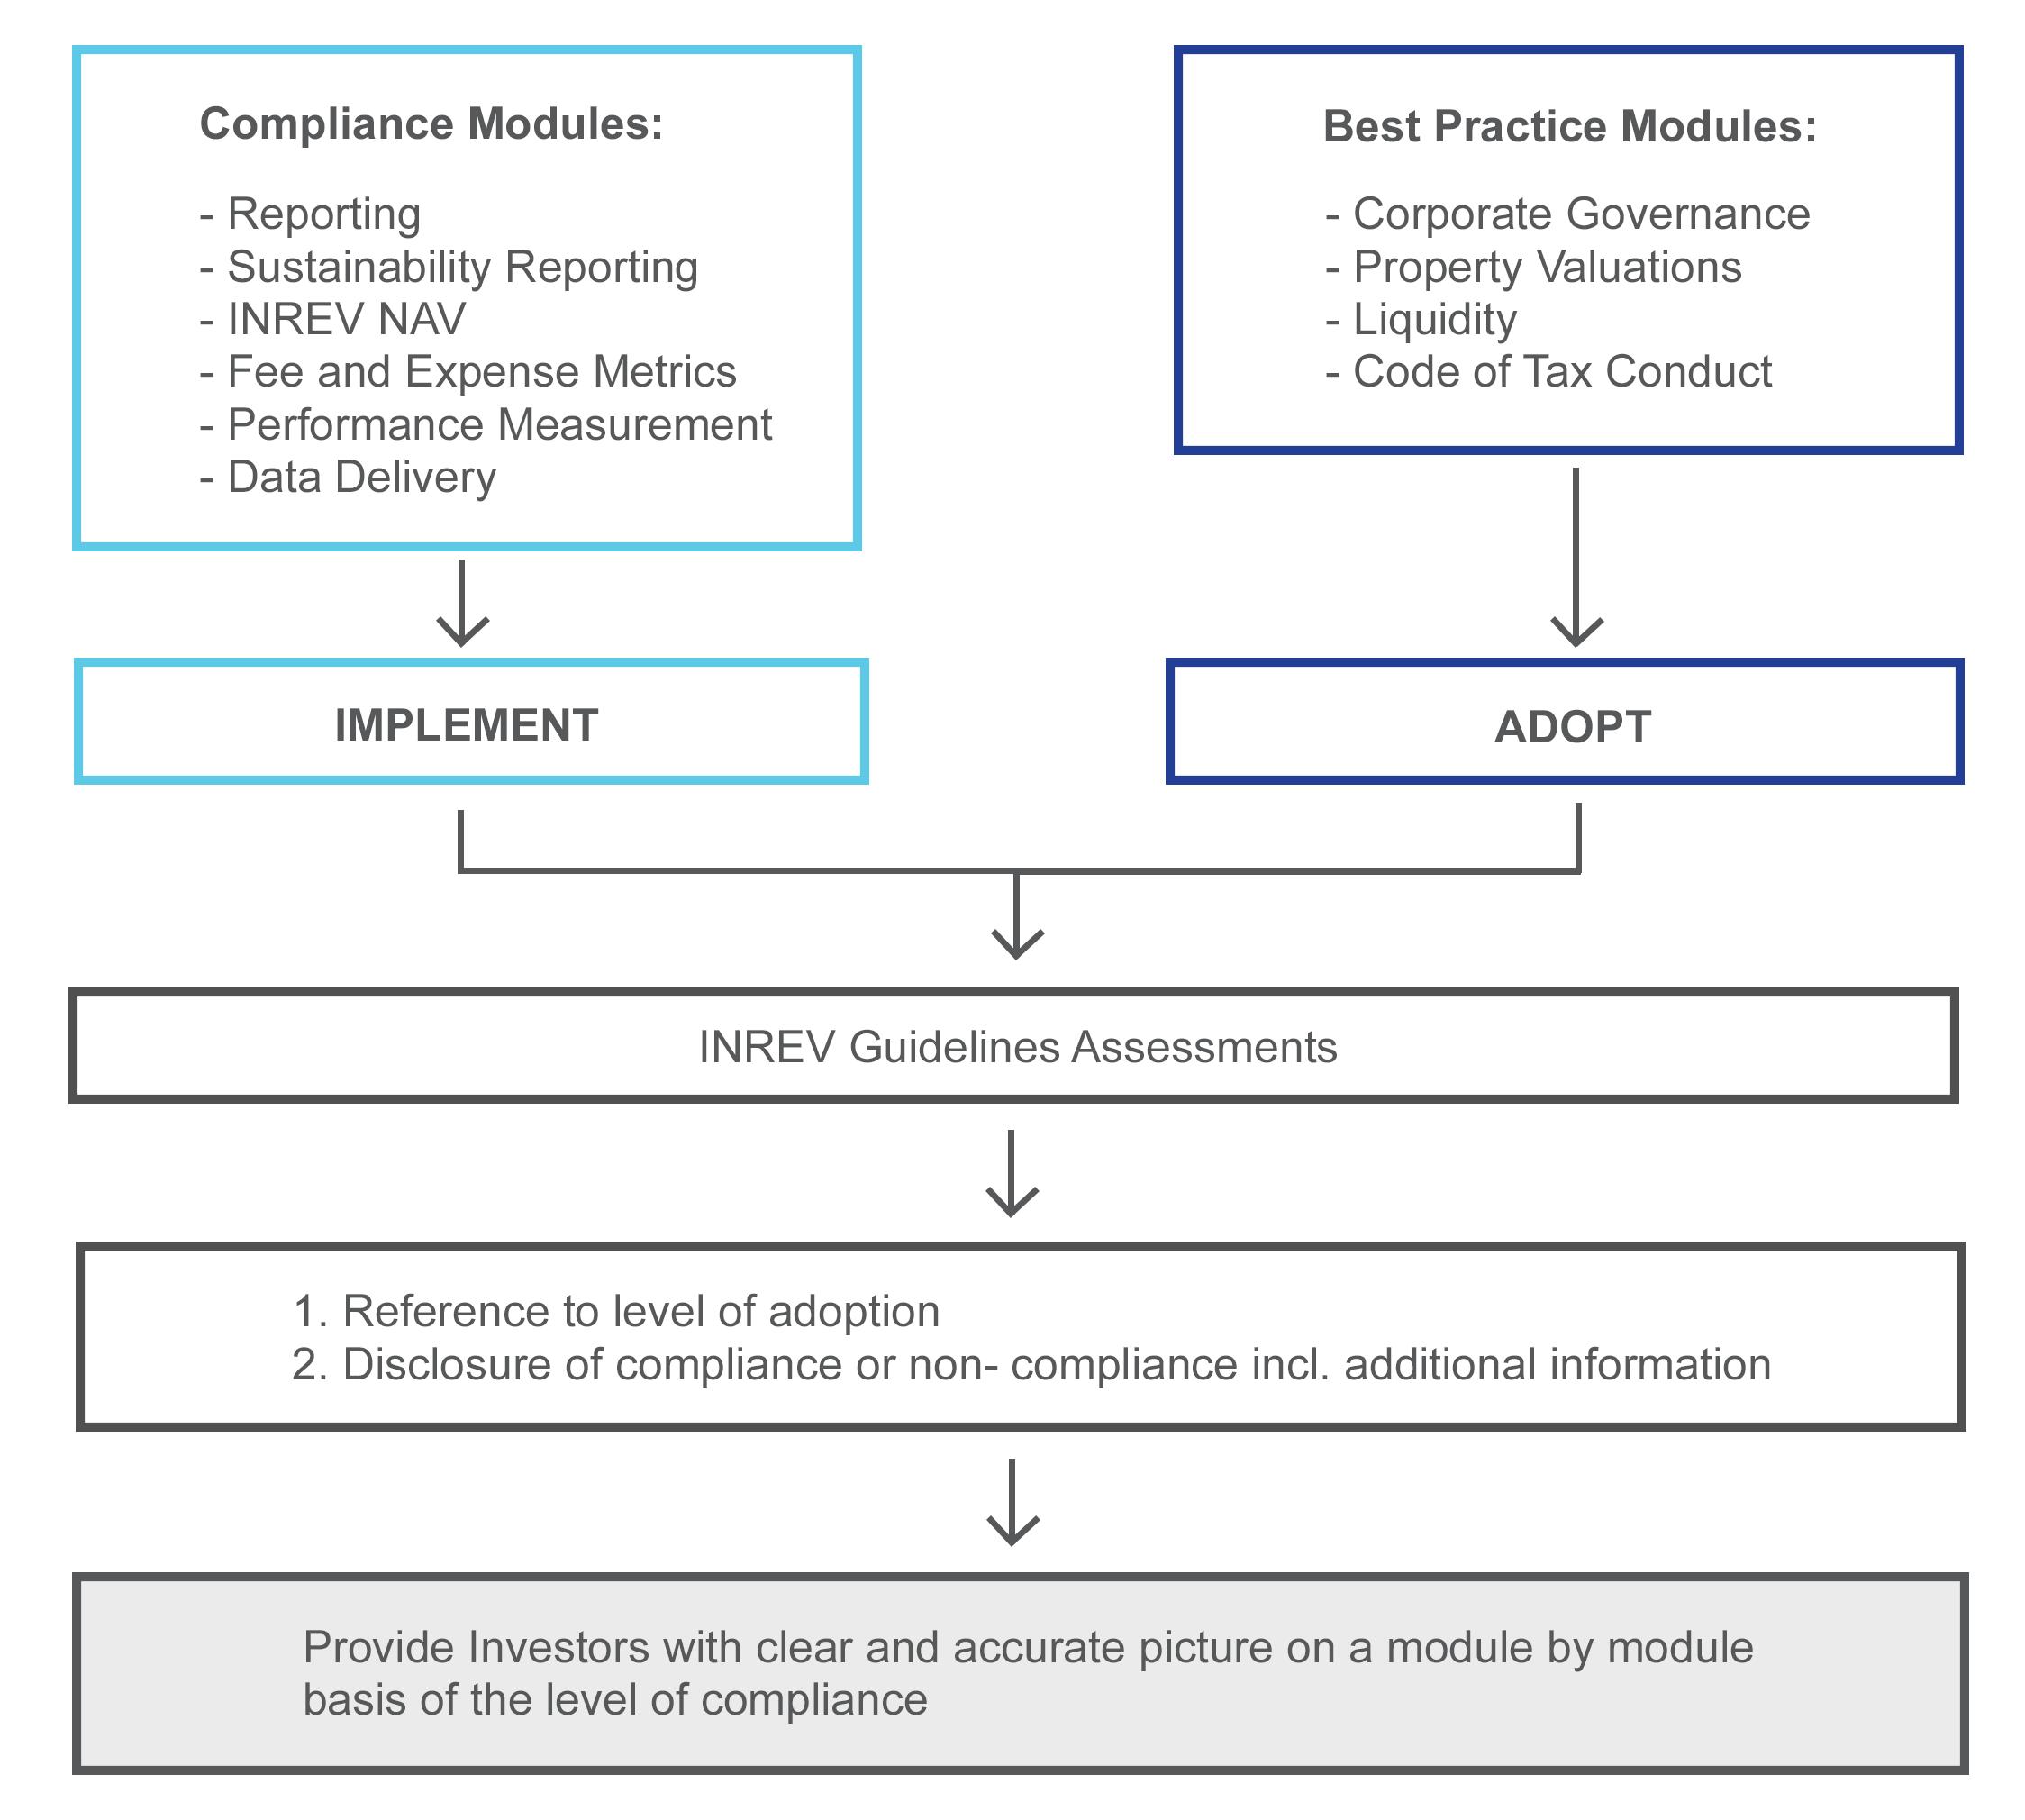 Adoption and Compliance Framework modules